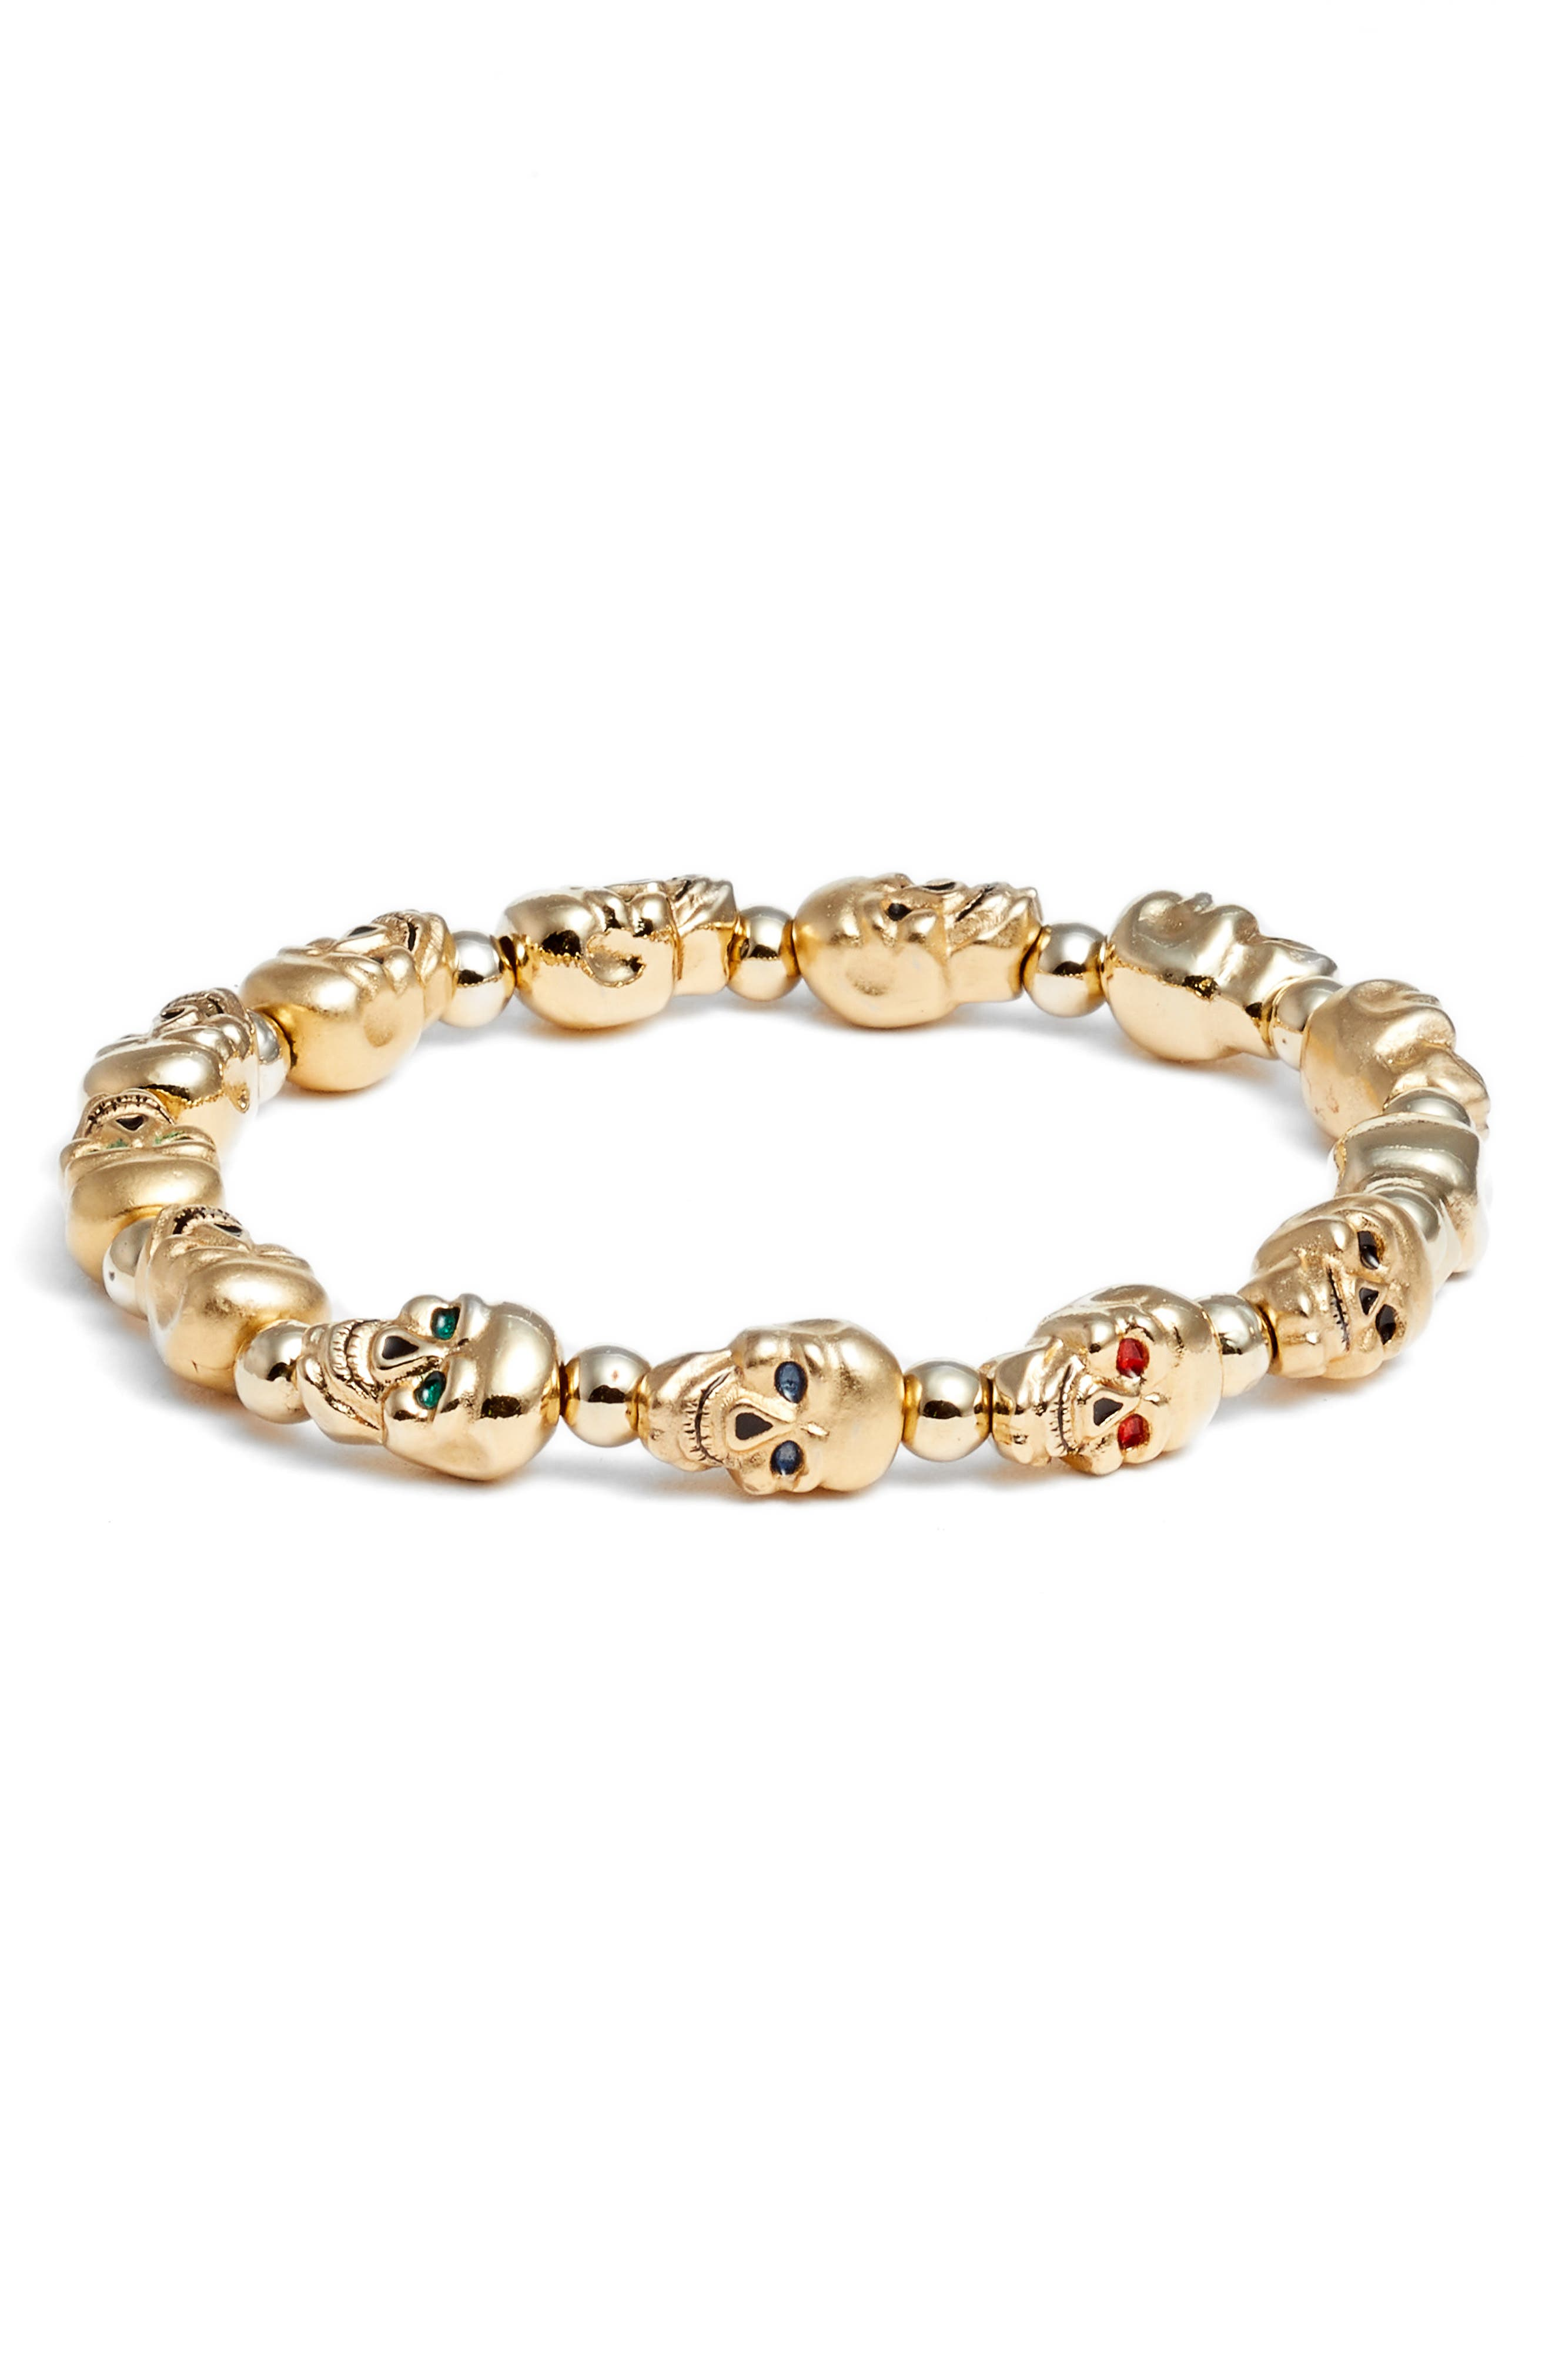 Lucky Skulls Stretch Bracelet,                             Main thumbnail 1, color,                             GOLD